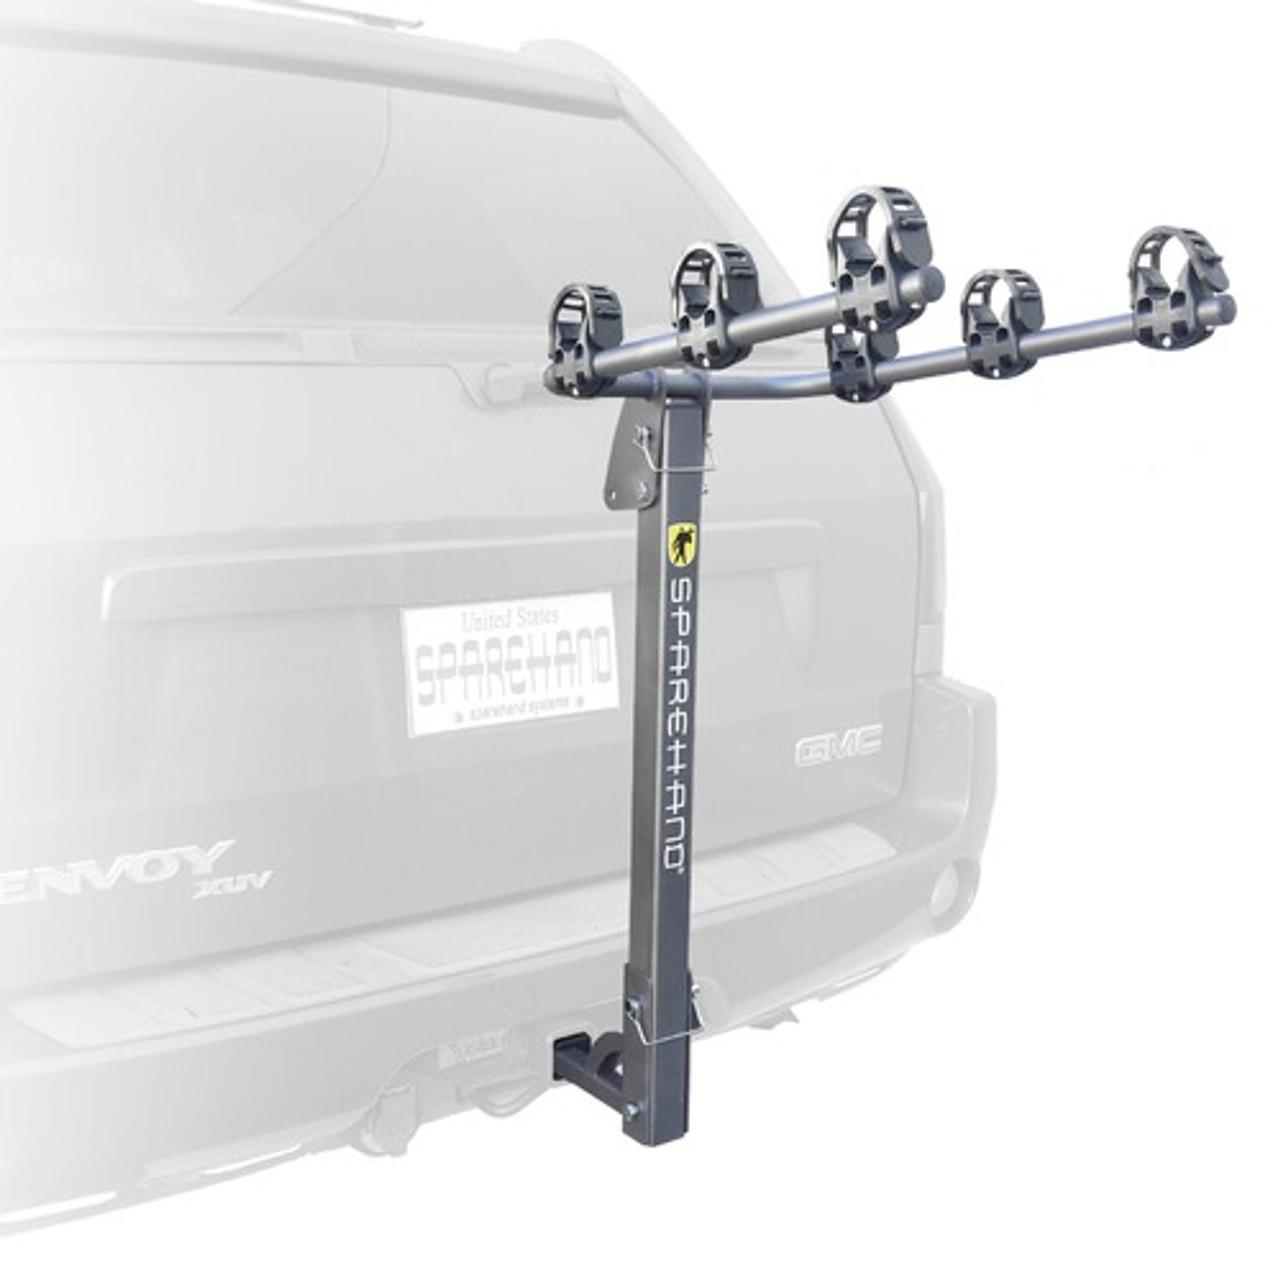 trailer hitch bike rack